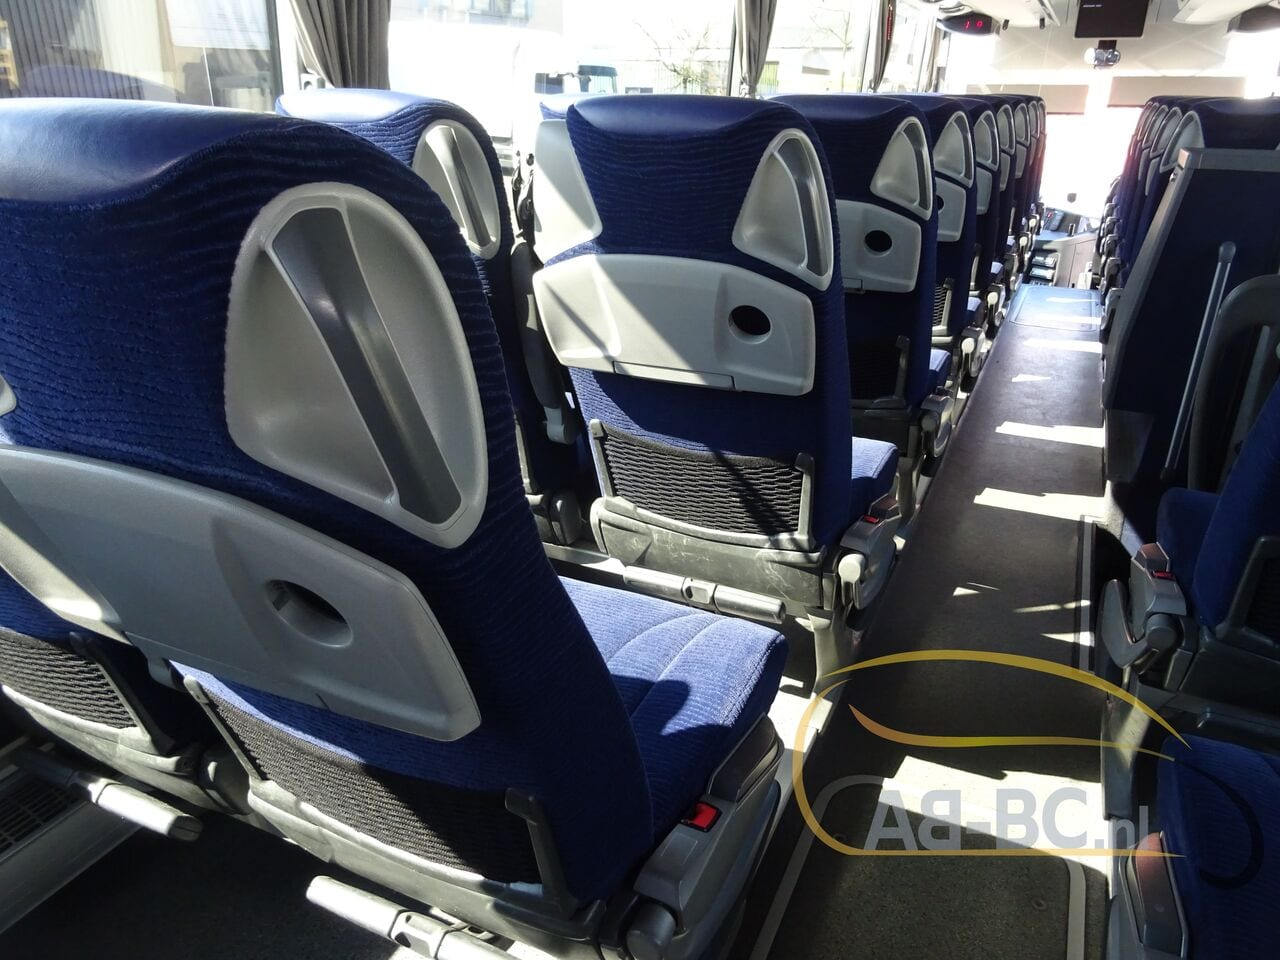 coach-busSETRA-S415-GT-HD-FINAL-EDITION-51-SEATS-LIFTBUS---1620382120819427860_big_963bed9b216b5f584581c437817206bb--21050713010665719300